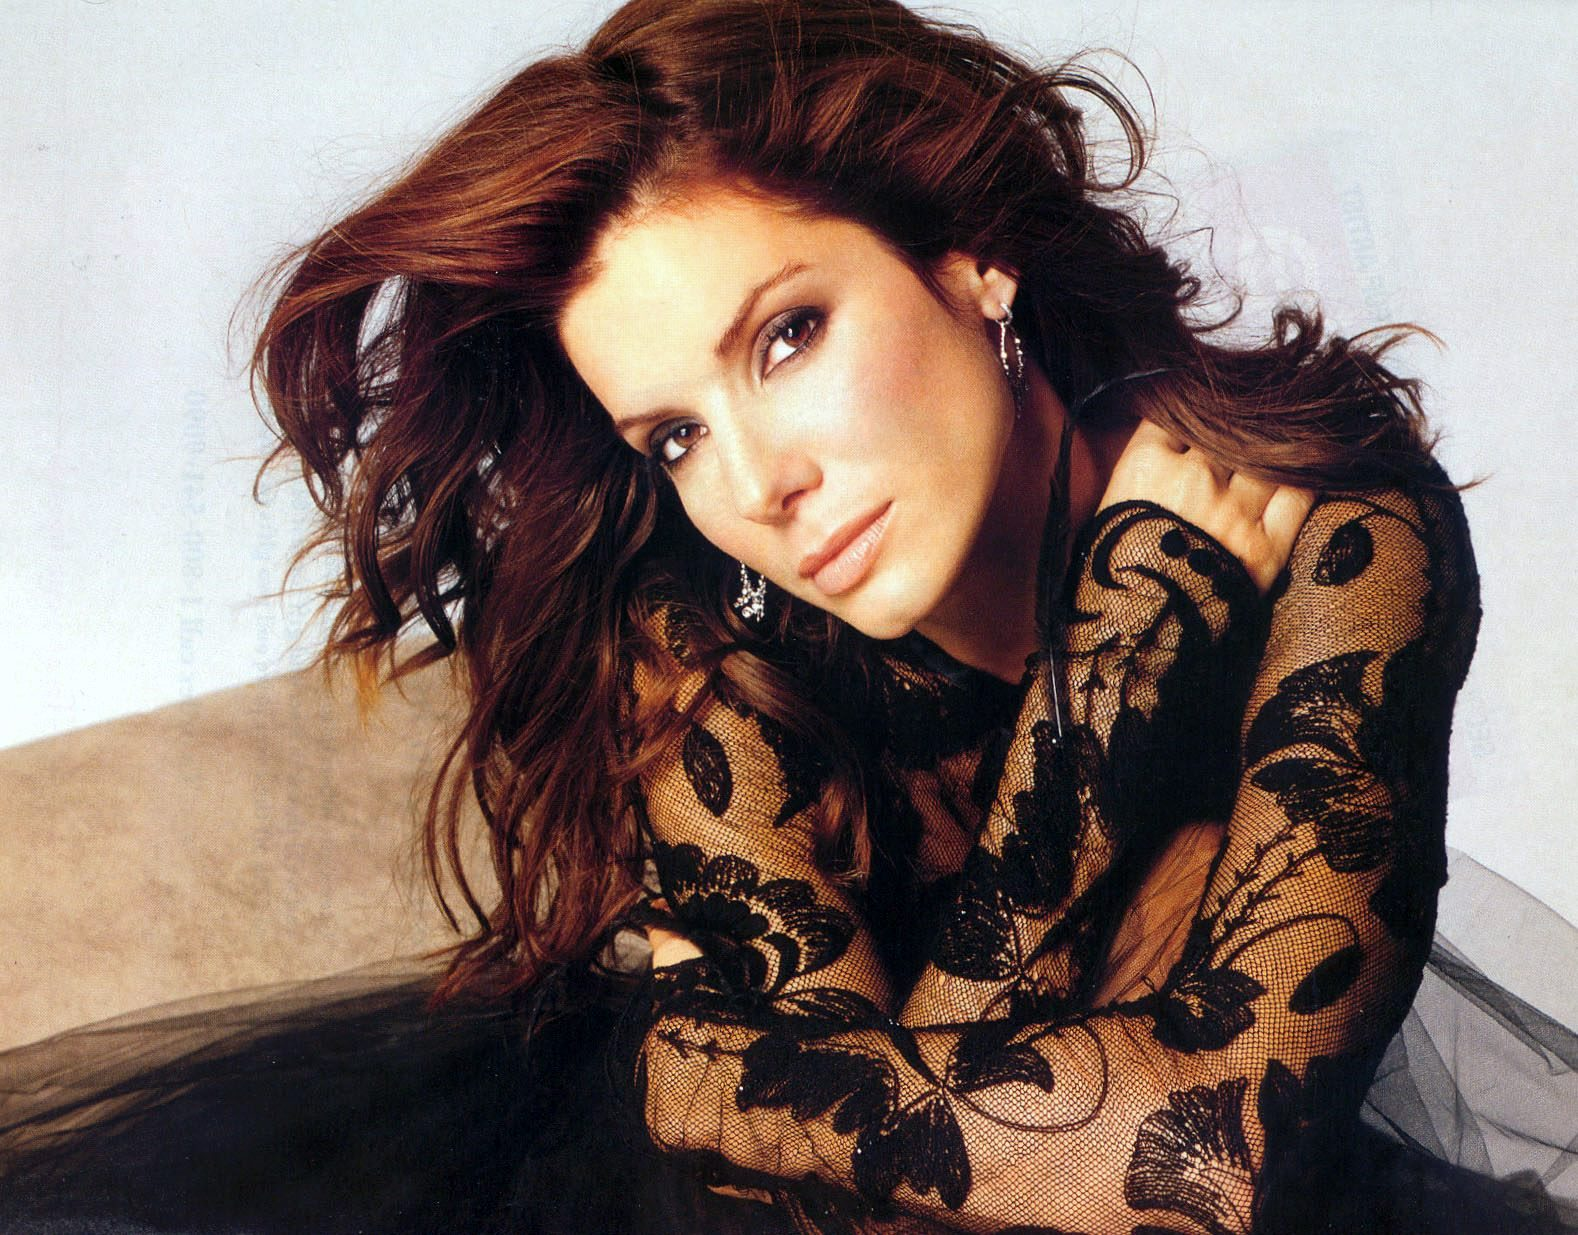 http://1.bp.blogspot.com/-_cJfWgExsGM/UH-UyFDJVvI/AAAAAAAAGTE/xKfzaUGuhTE/s1600/Sandra-bullock-hairstyles-69.jpg